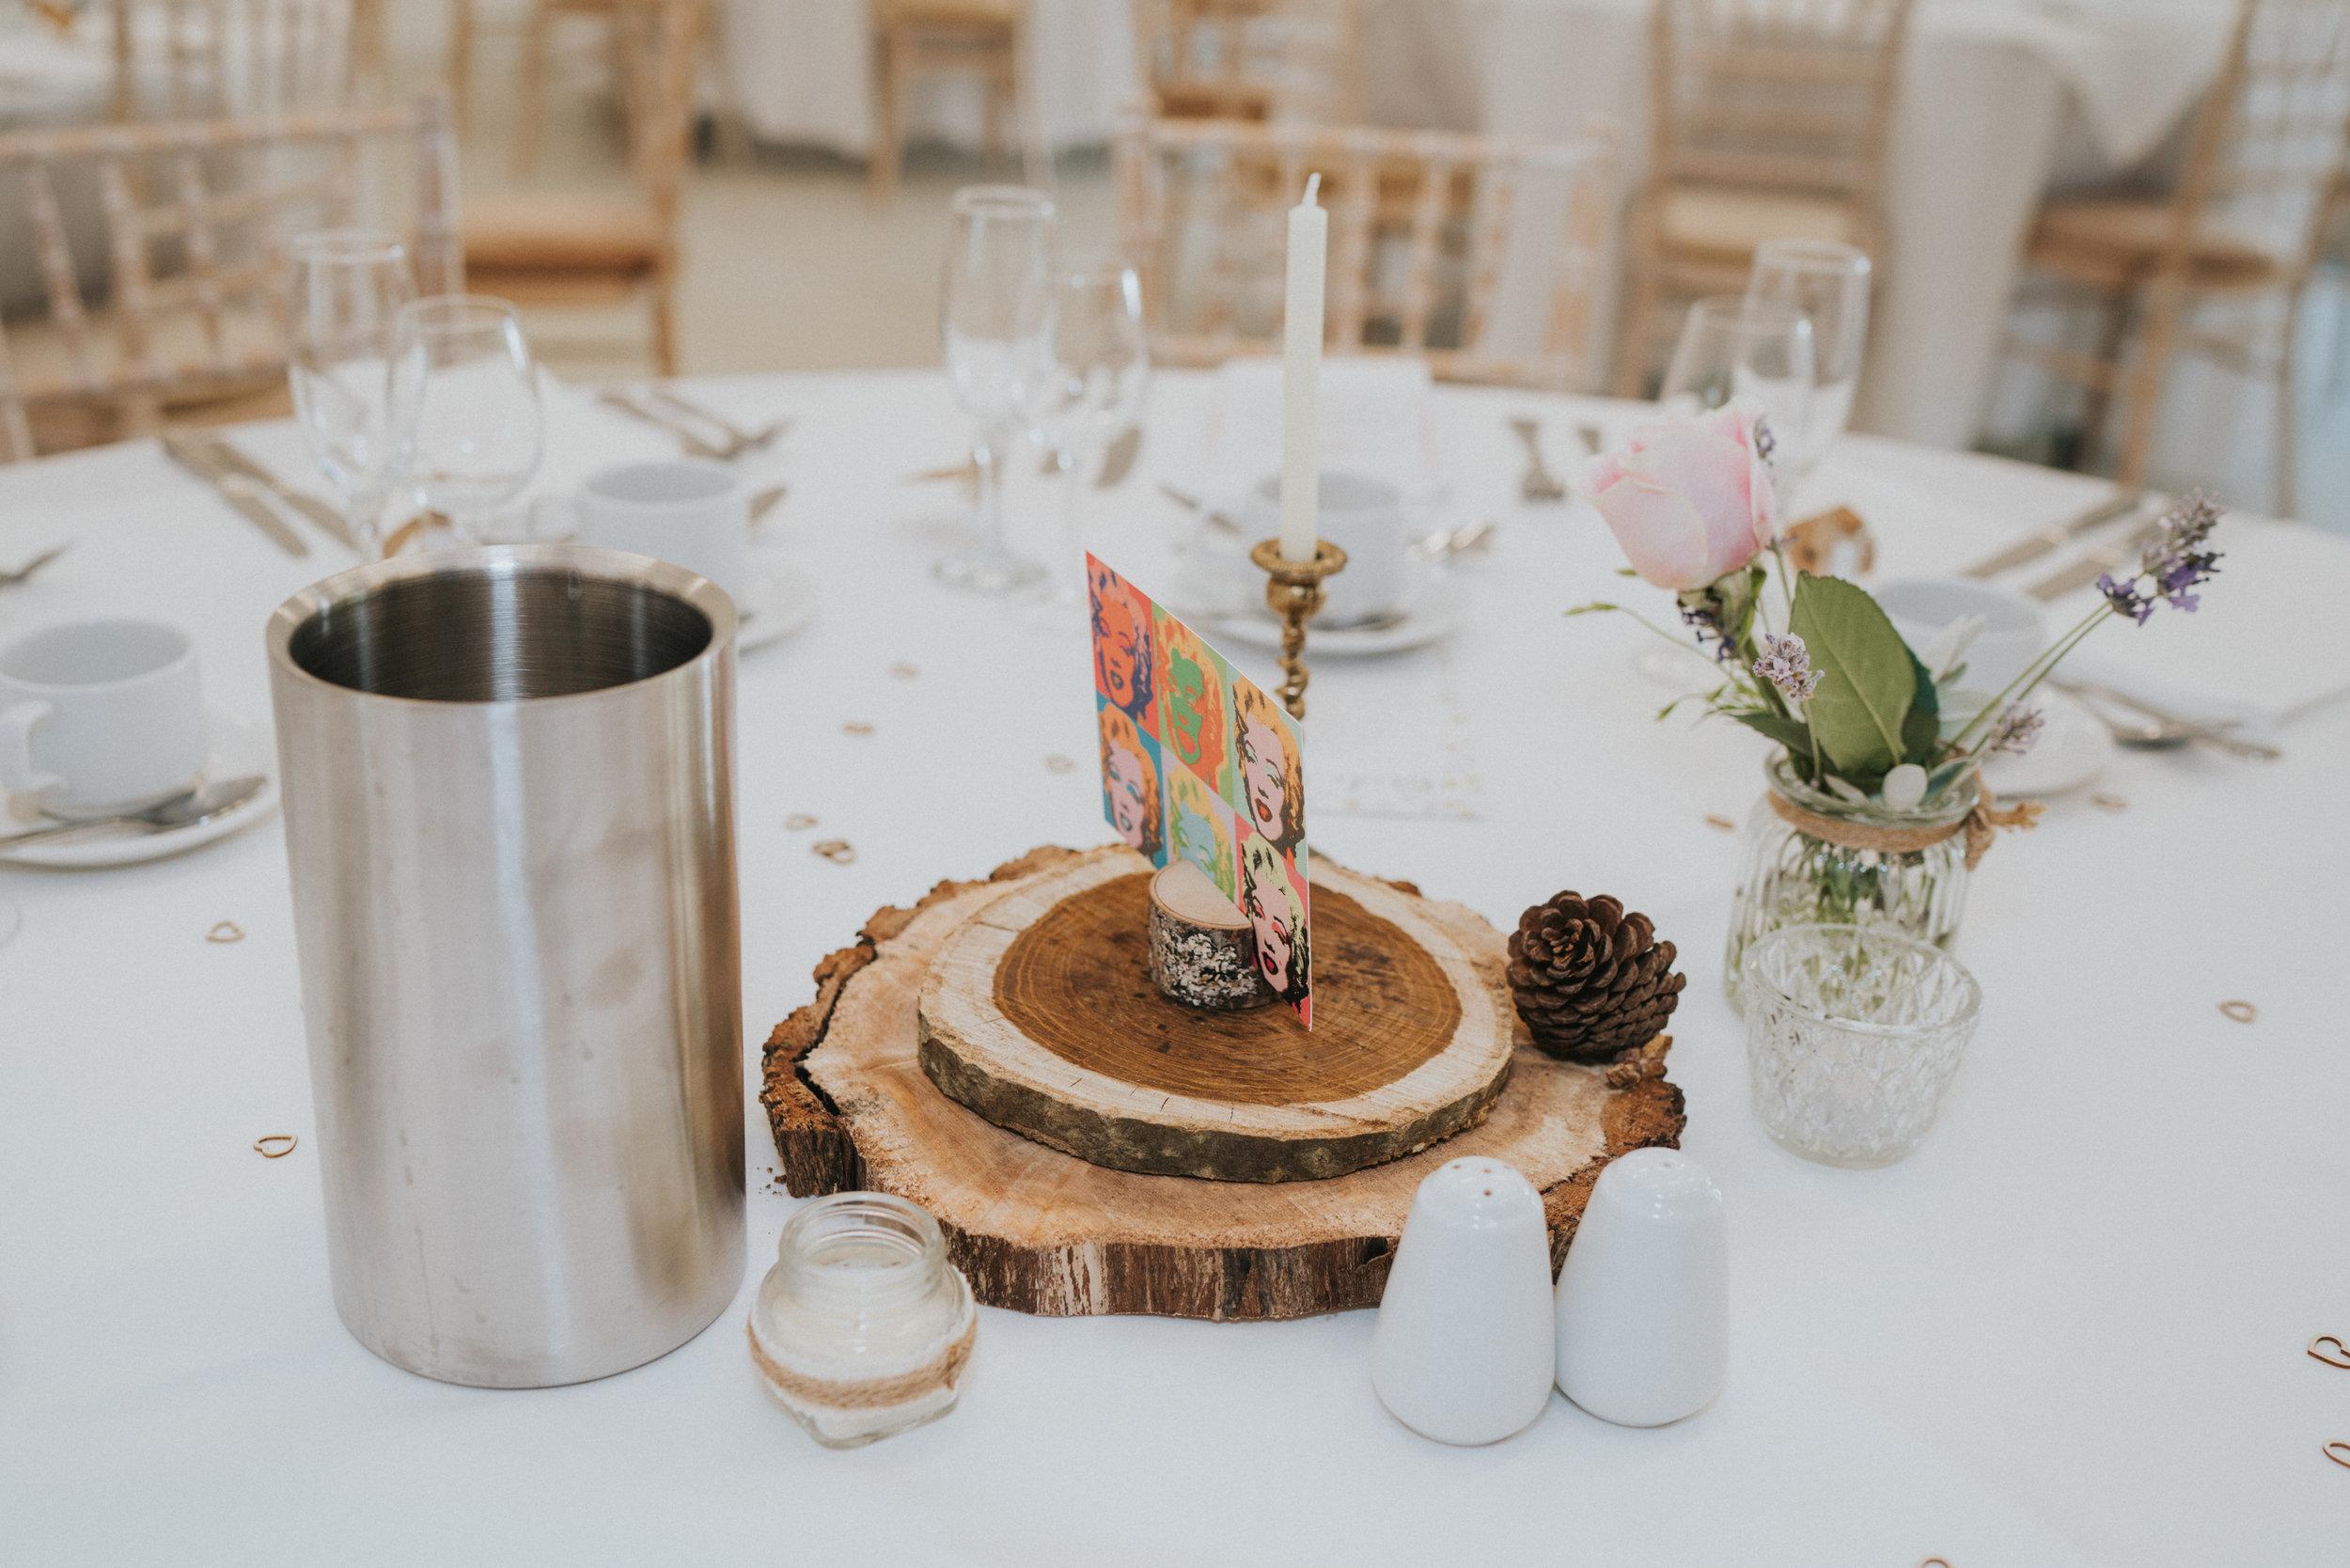 Grace-Elizabeth-Georgie-Amalaketu-Firstsite-Colchester-Essex-Boho-Buddhist-Wedding-Alternative-Wedding-Photography-Essex (71 of 100).jpg